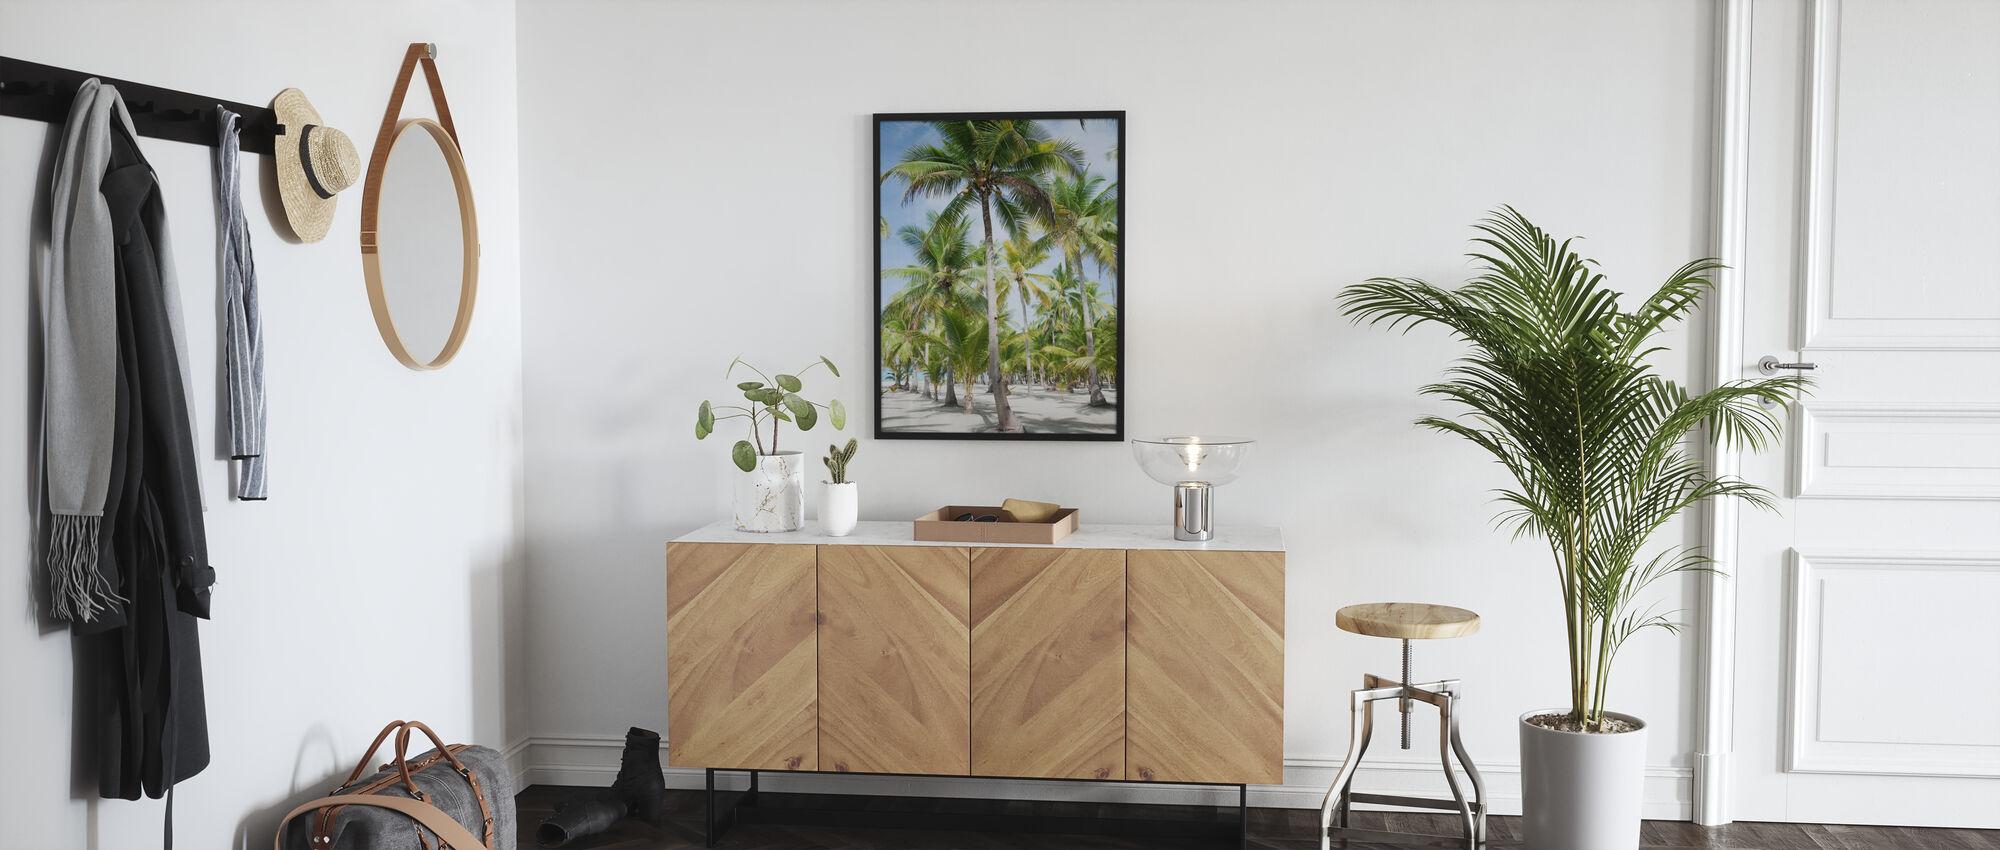 Palmen in Bohol, Phillipinen - Poster - Flur